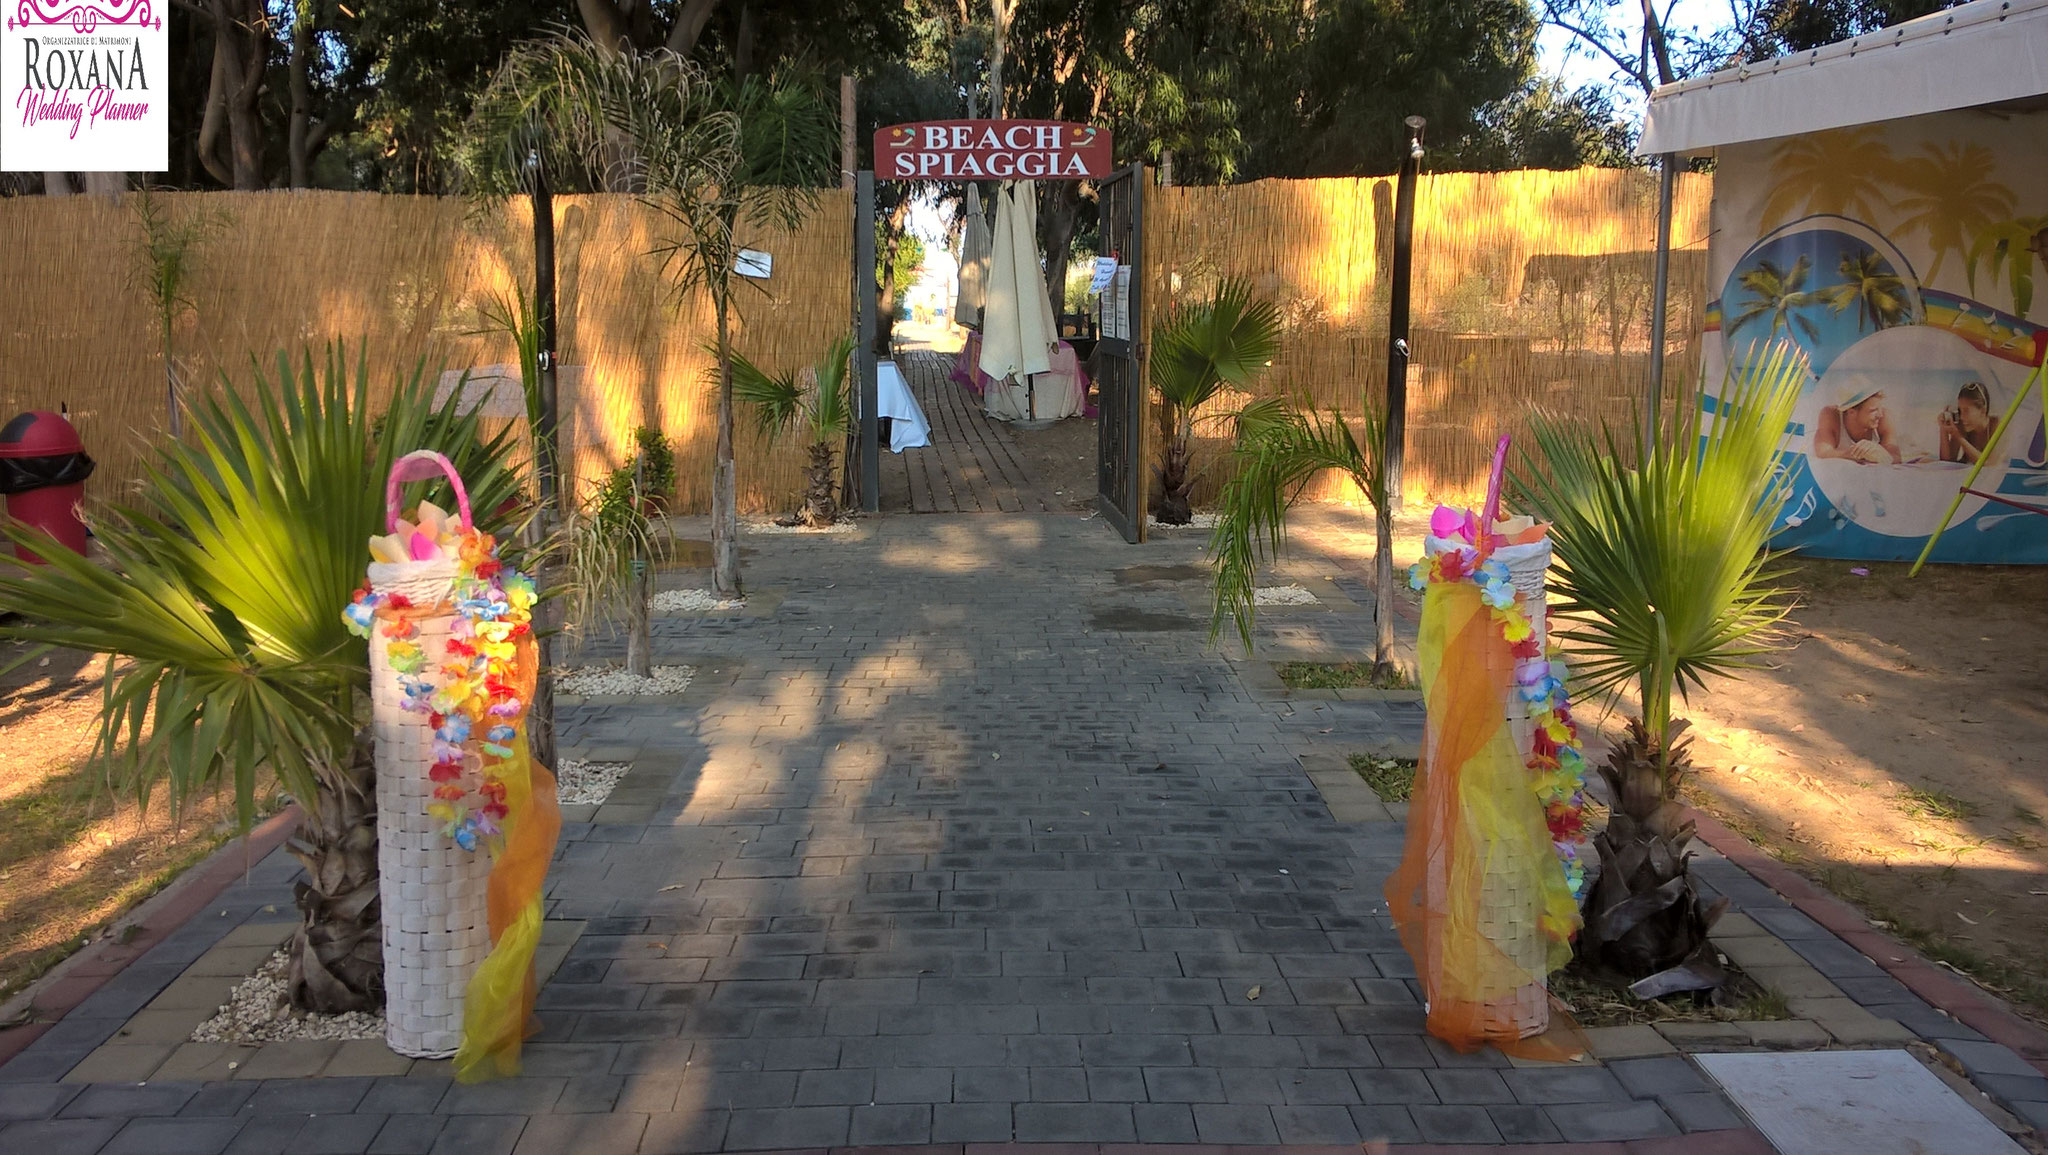 Matrimonio Tema Hawaiano : Matrimonio in spiaggia sicilia roxana wedding planner